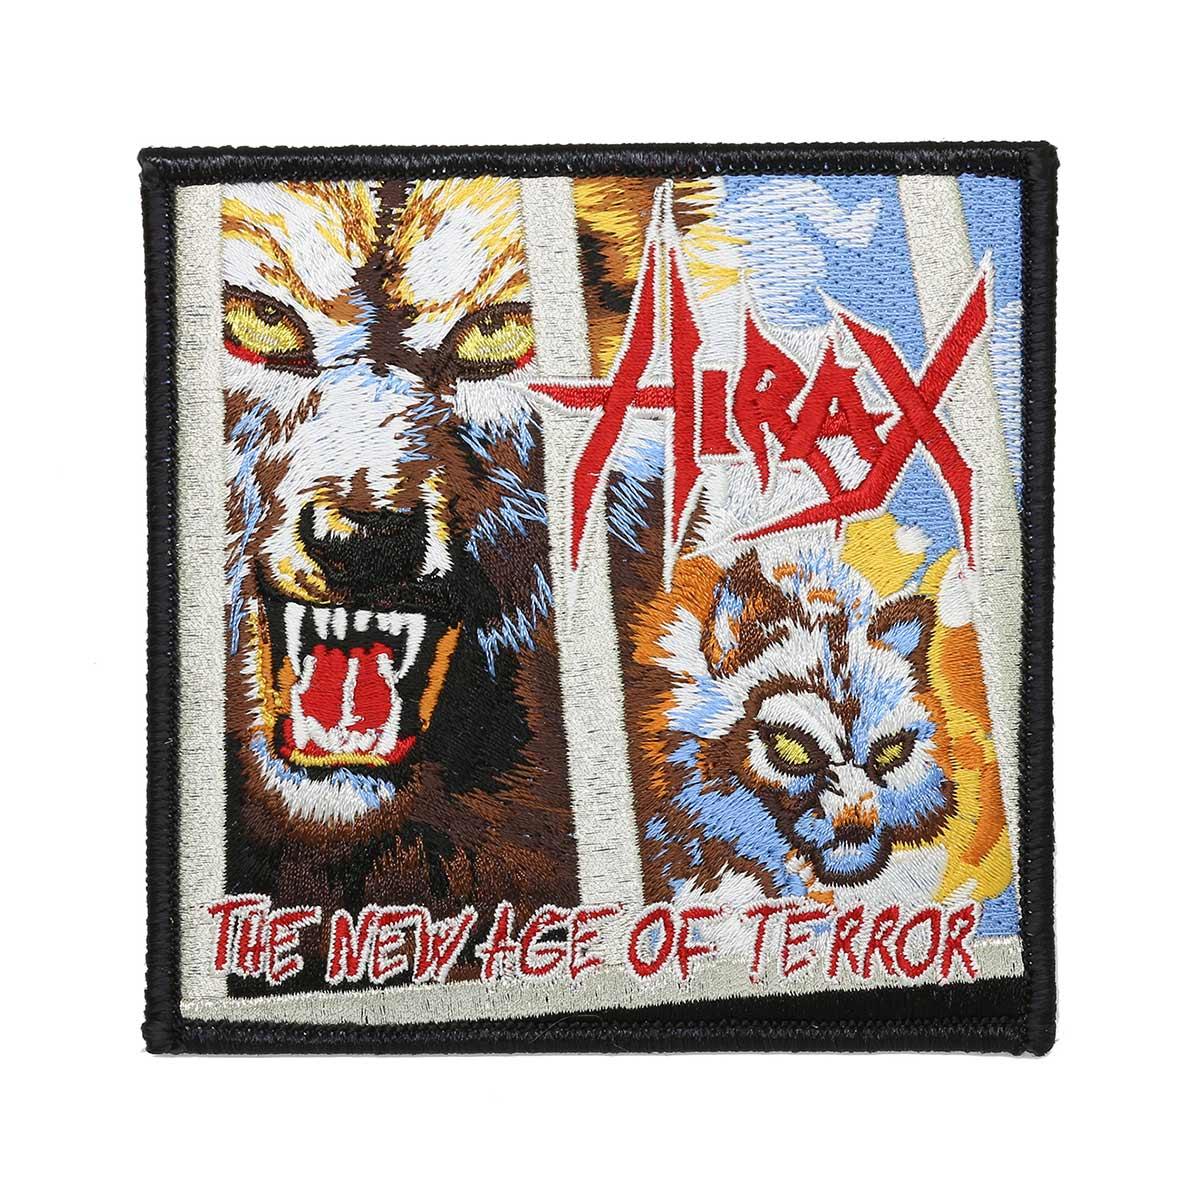 Термоаппликация AD1009 AIRAX (террор) Hobby&Pro